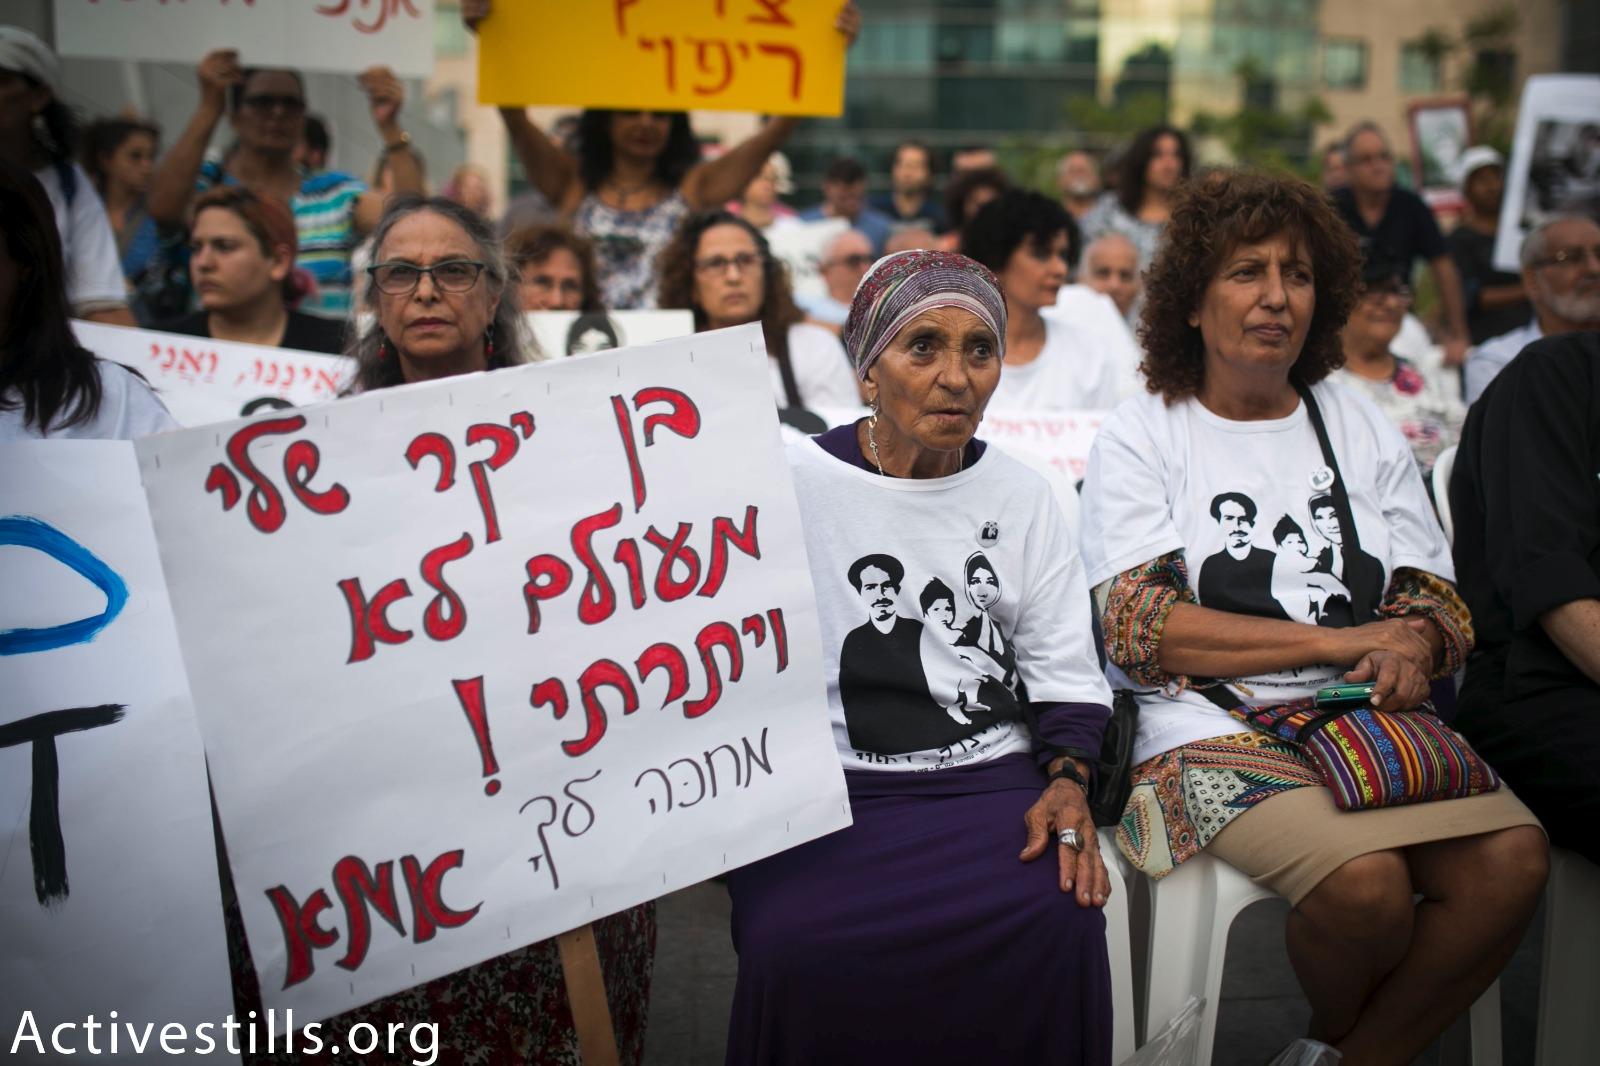 Demonstrators sit and listen to speeches during a protest to recognize the Yemenite Children's Affair, Tel Aviv, September 25, 2017. (Shiraz Grinbaum/Activestills.org)